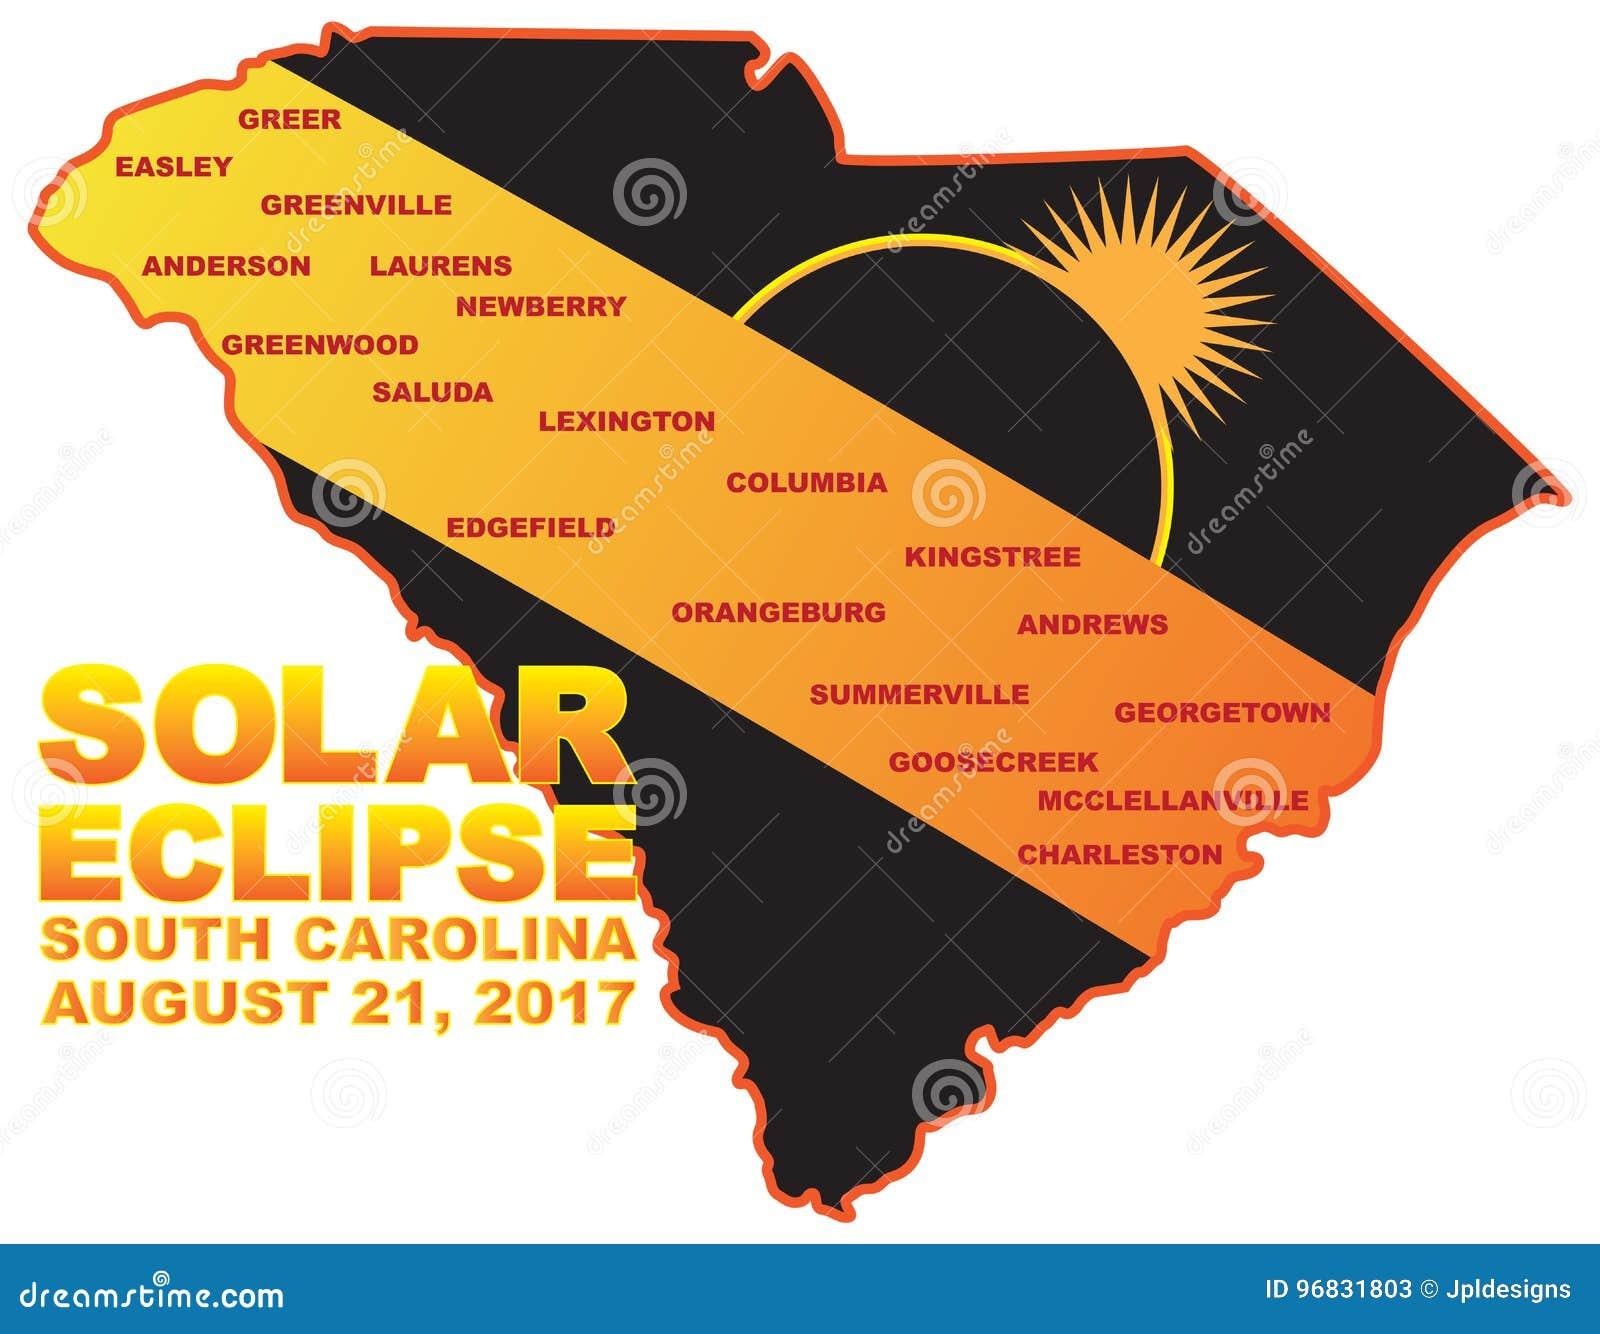 Solar Eclipse Across South Carolina Cities Map Illustration - South carolina cities map